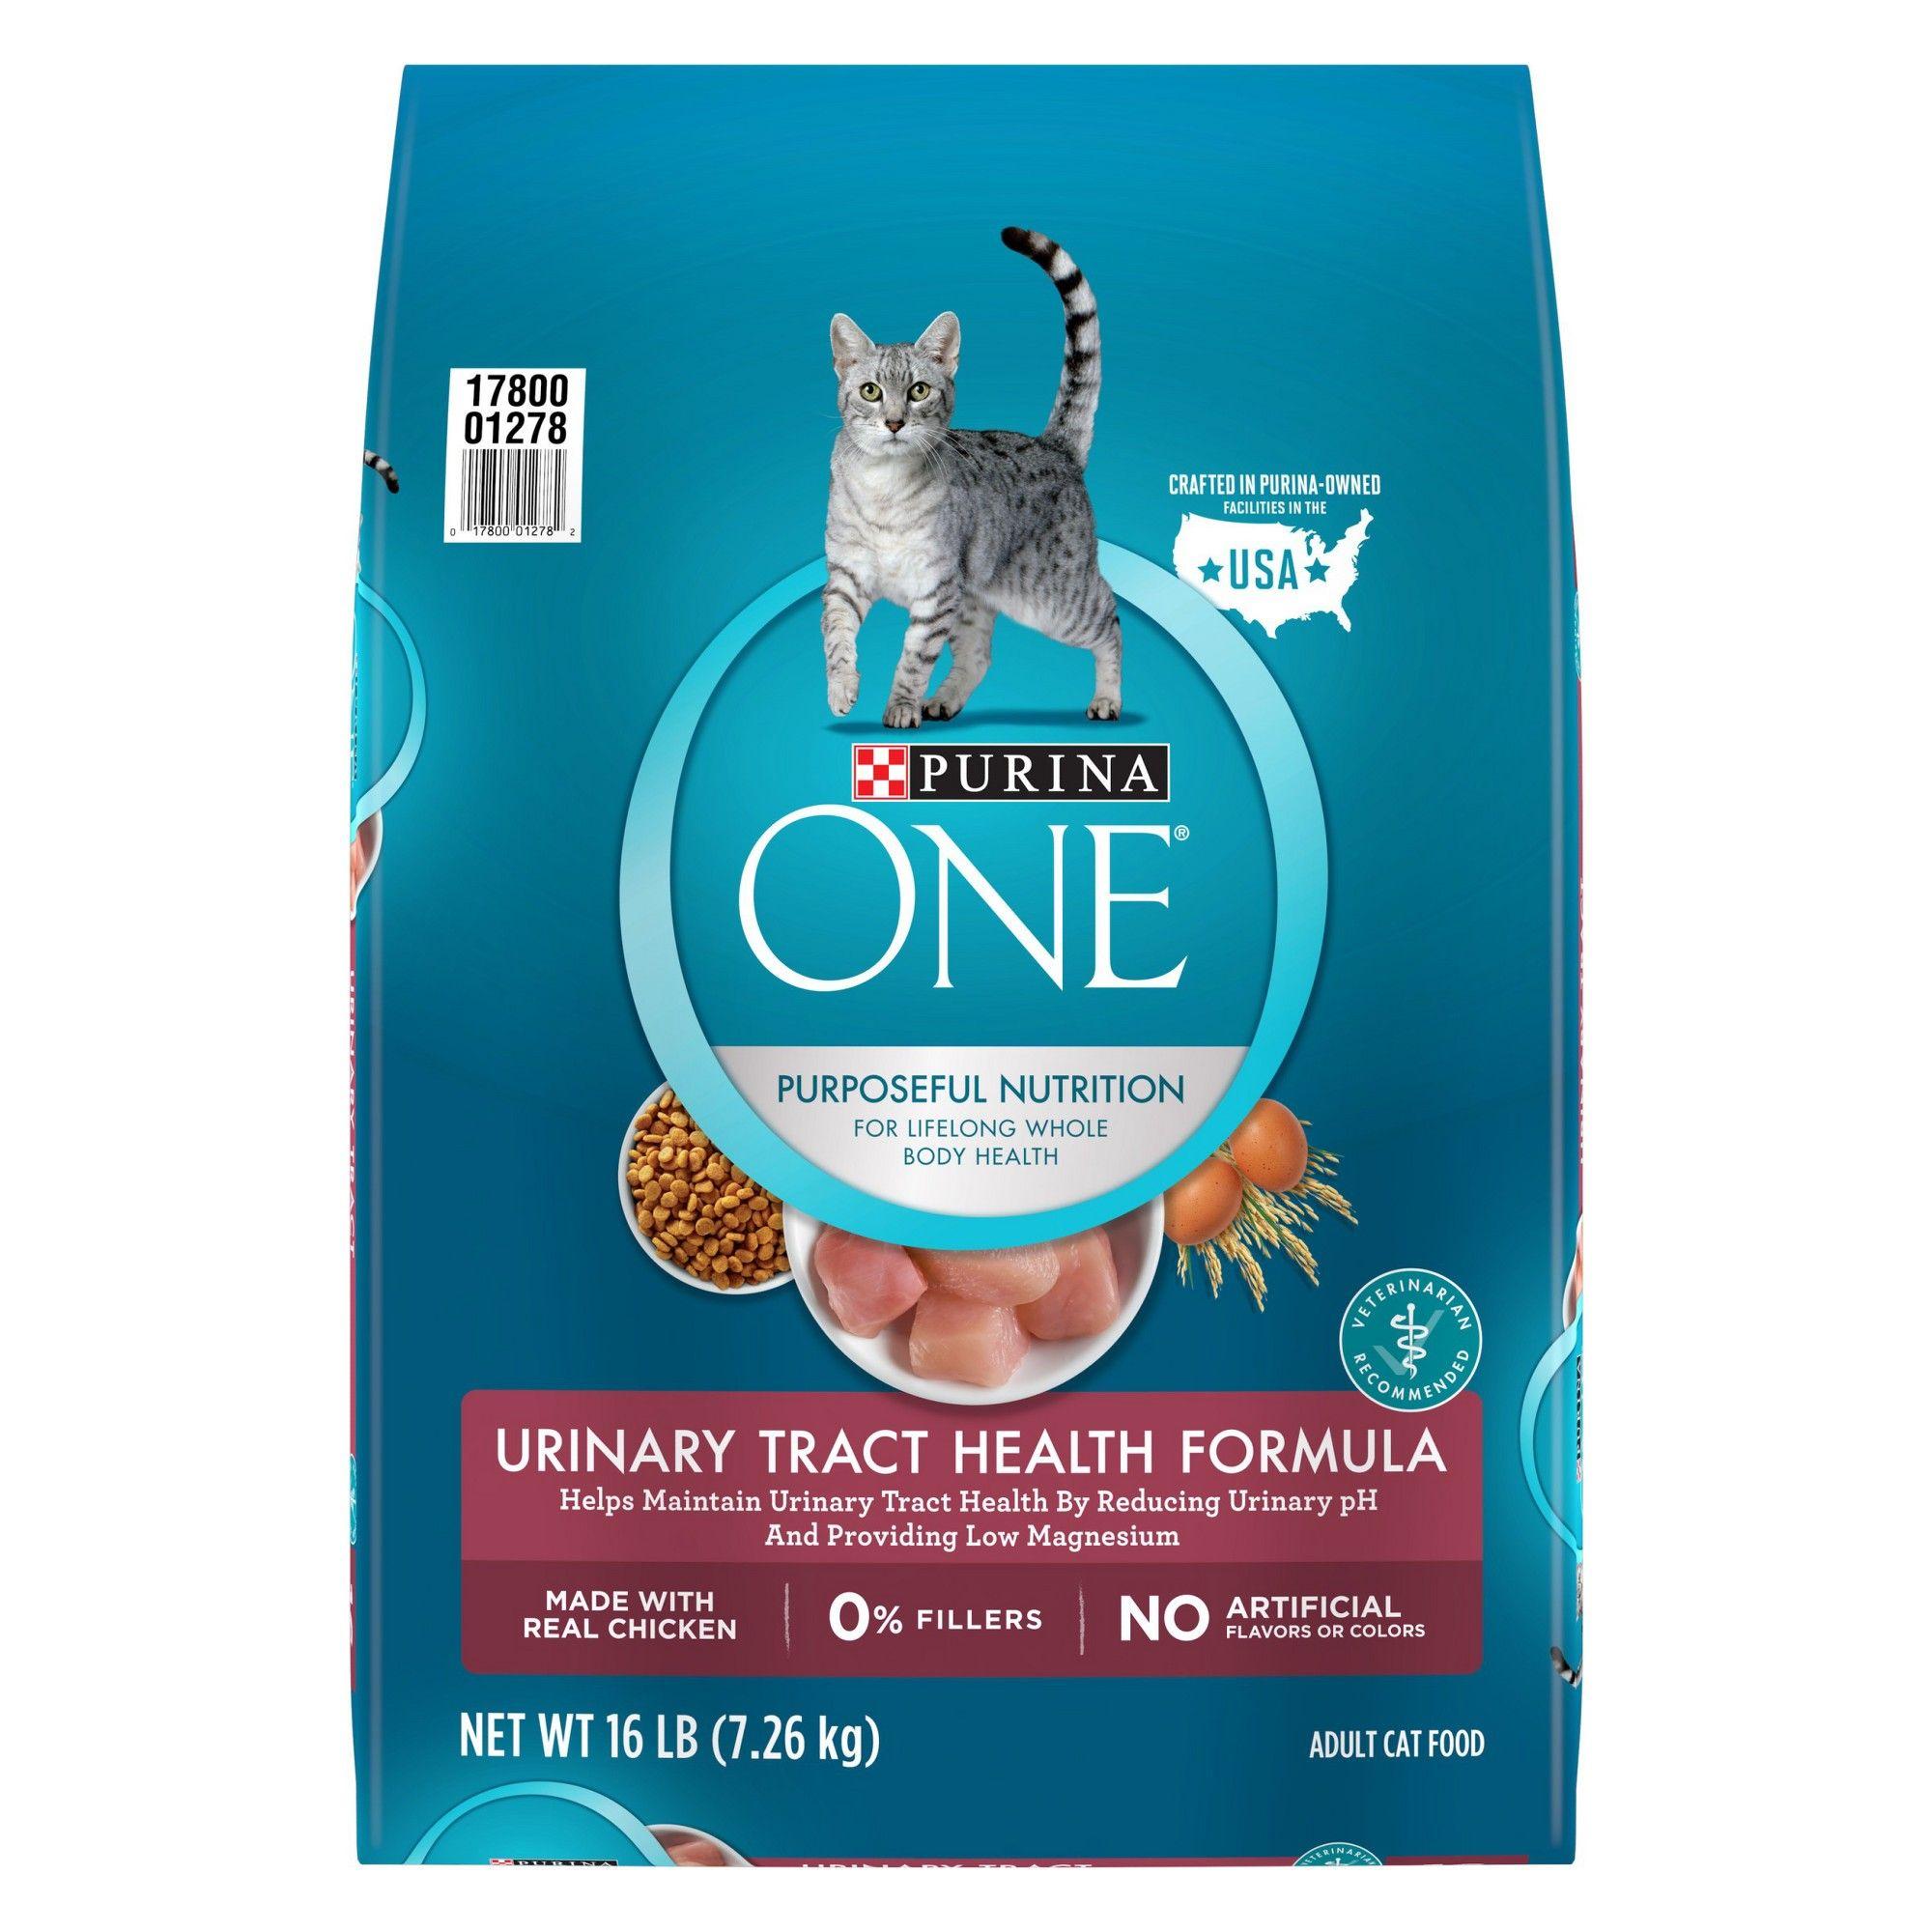 Purina One Urinary Tract Health Formula Adult Premium Dry